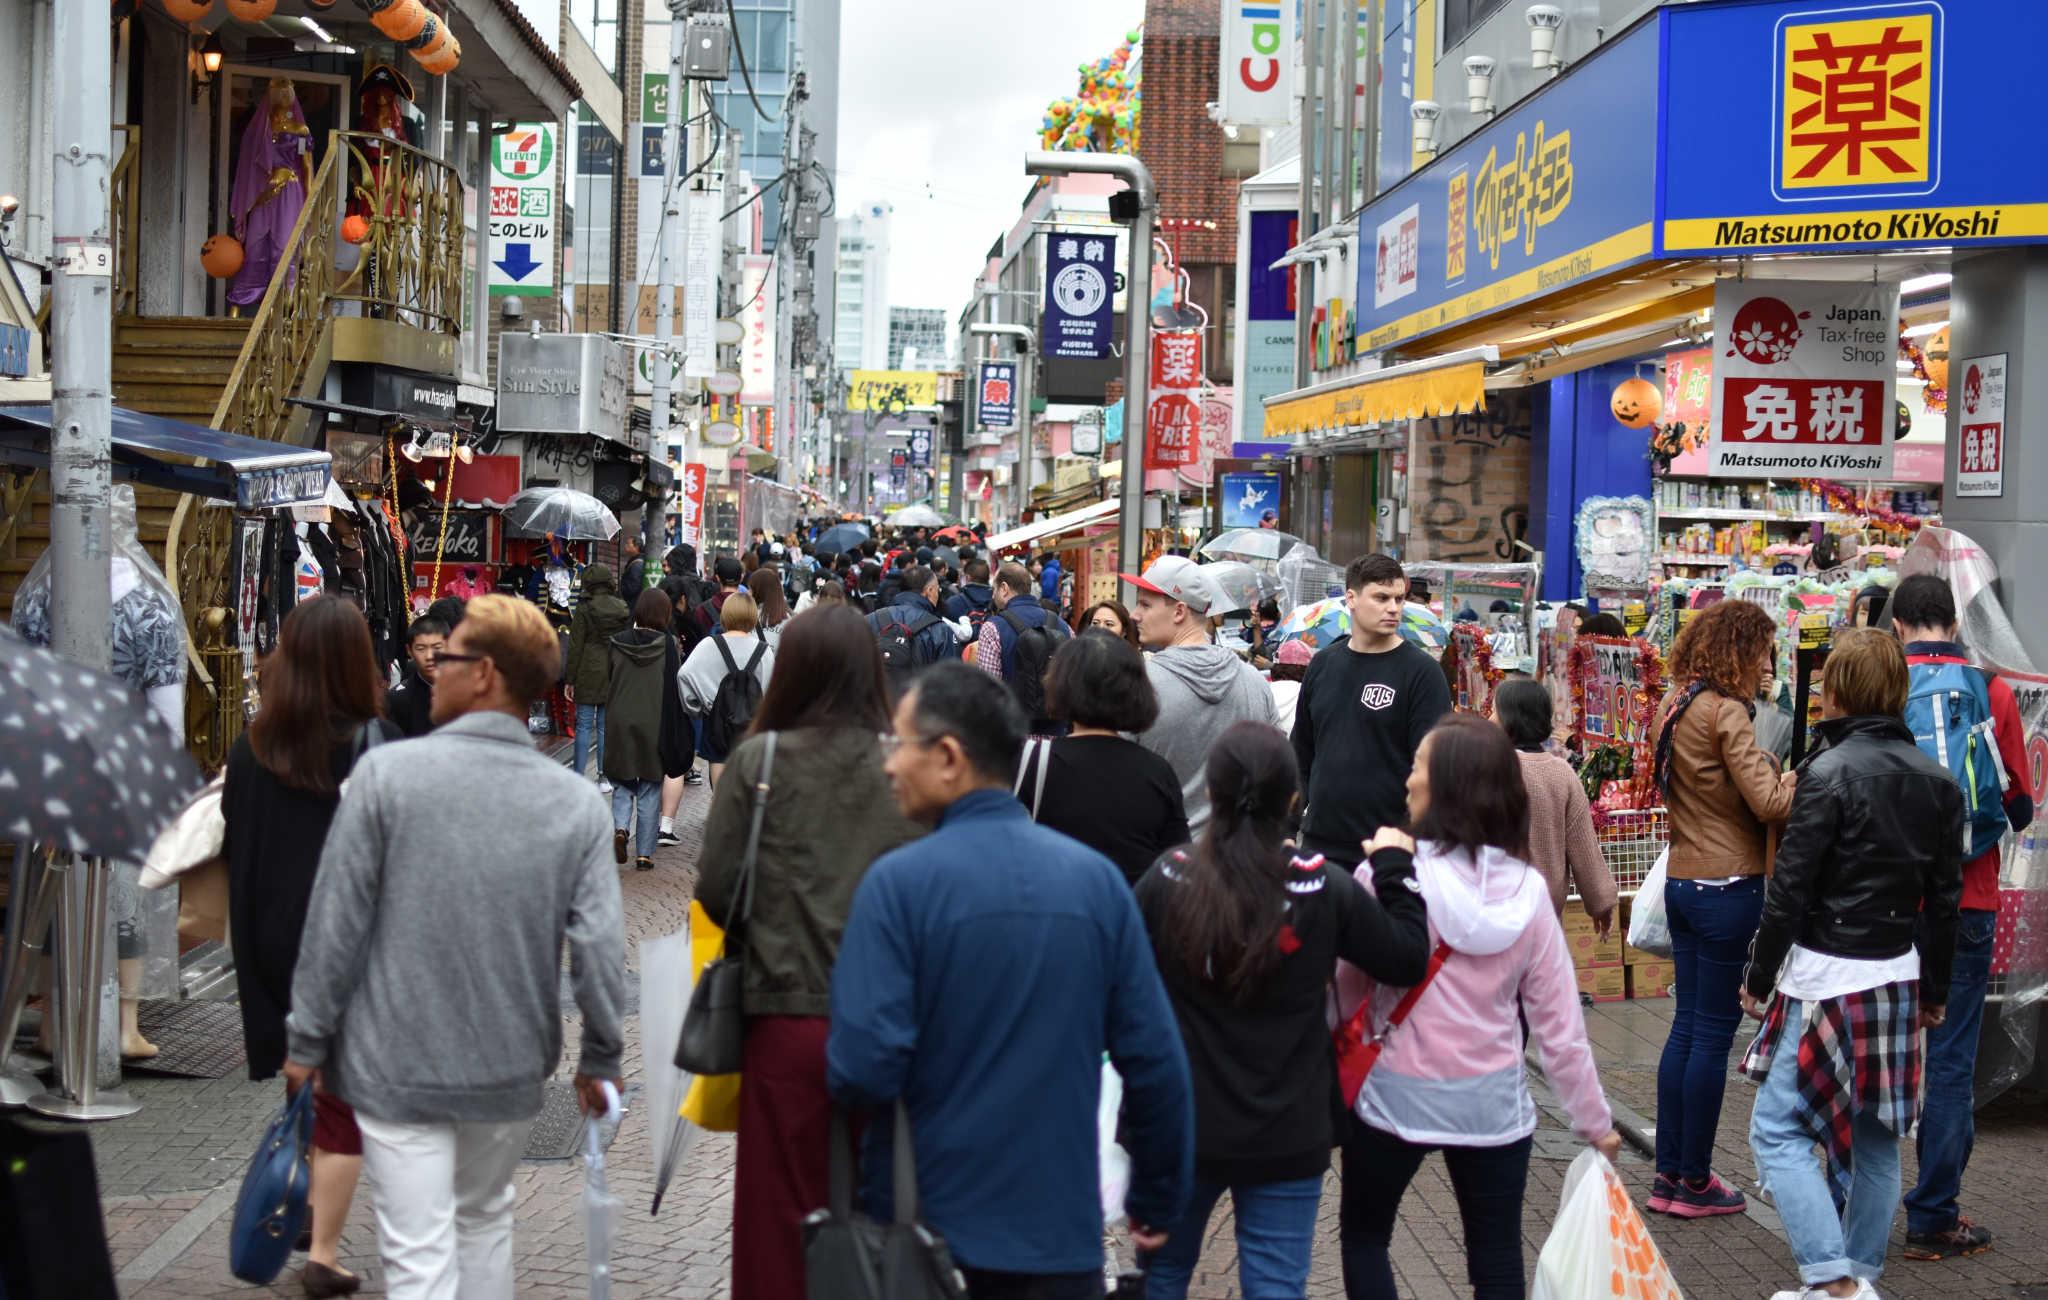 Takeshita Dori à Tokyo, des boutiques pour tous les styles